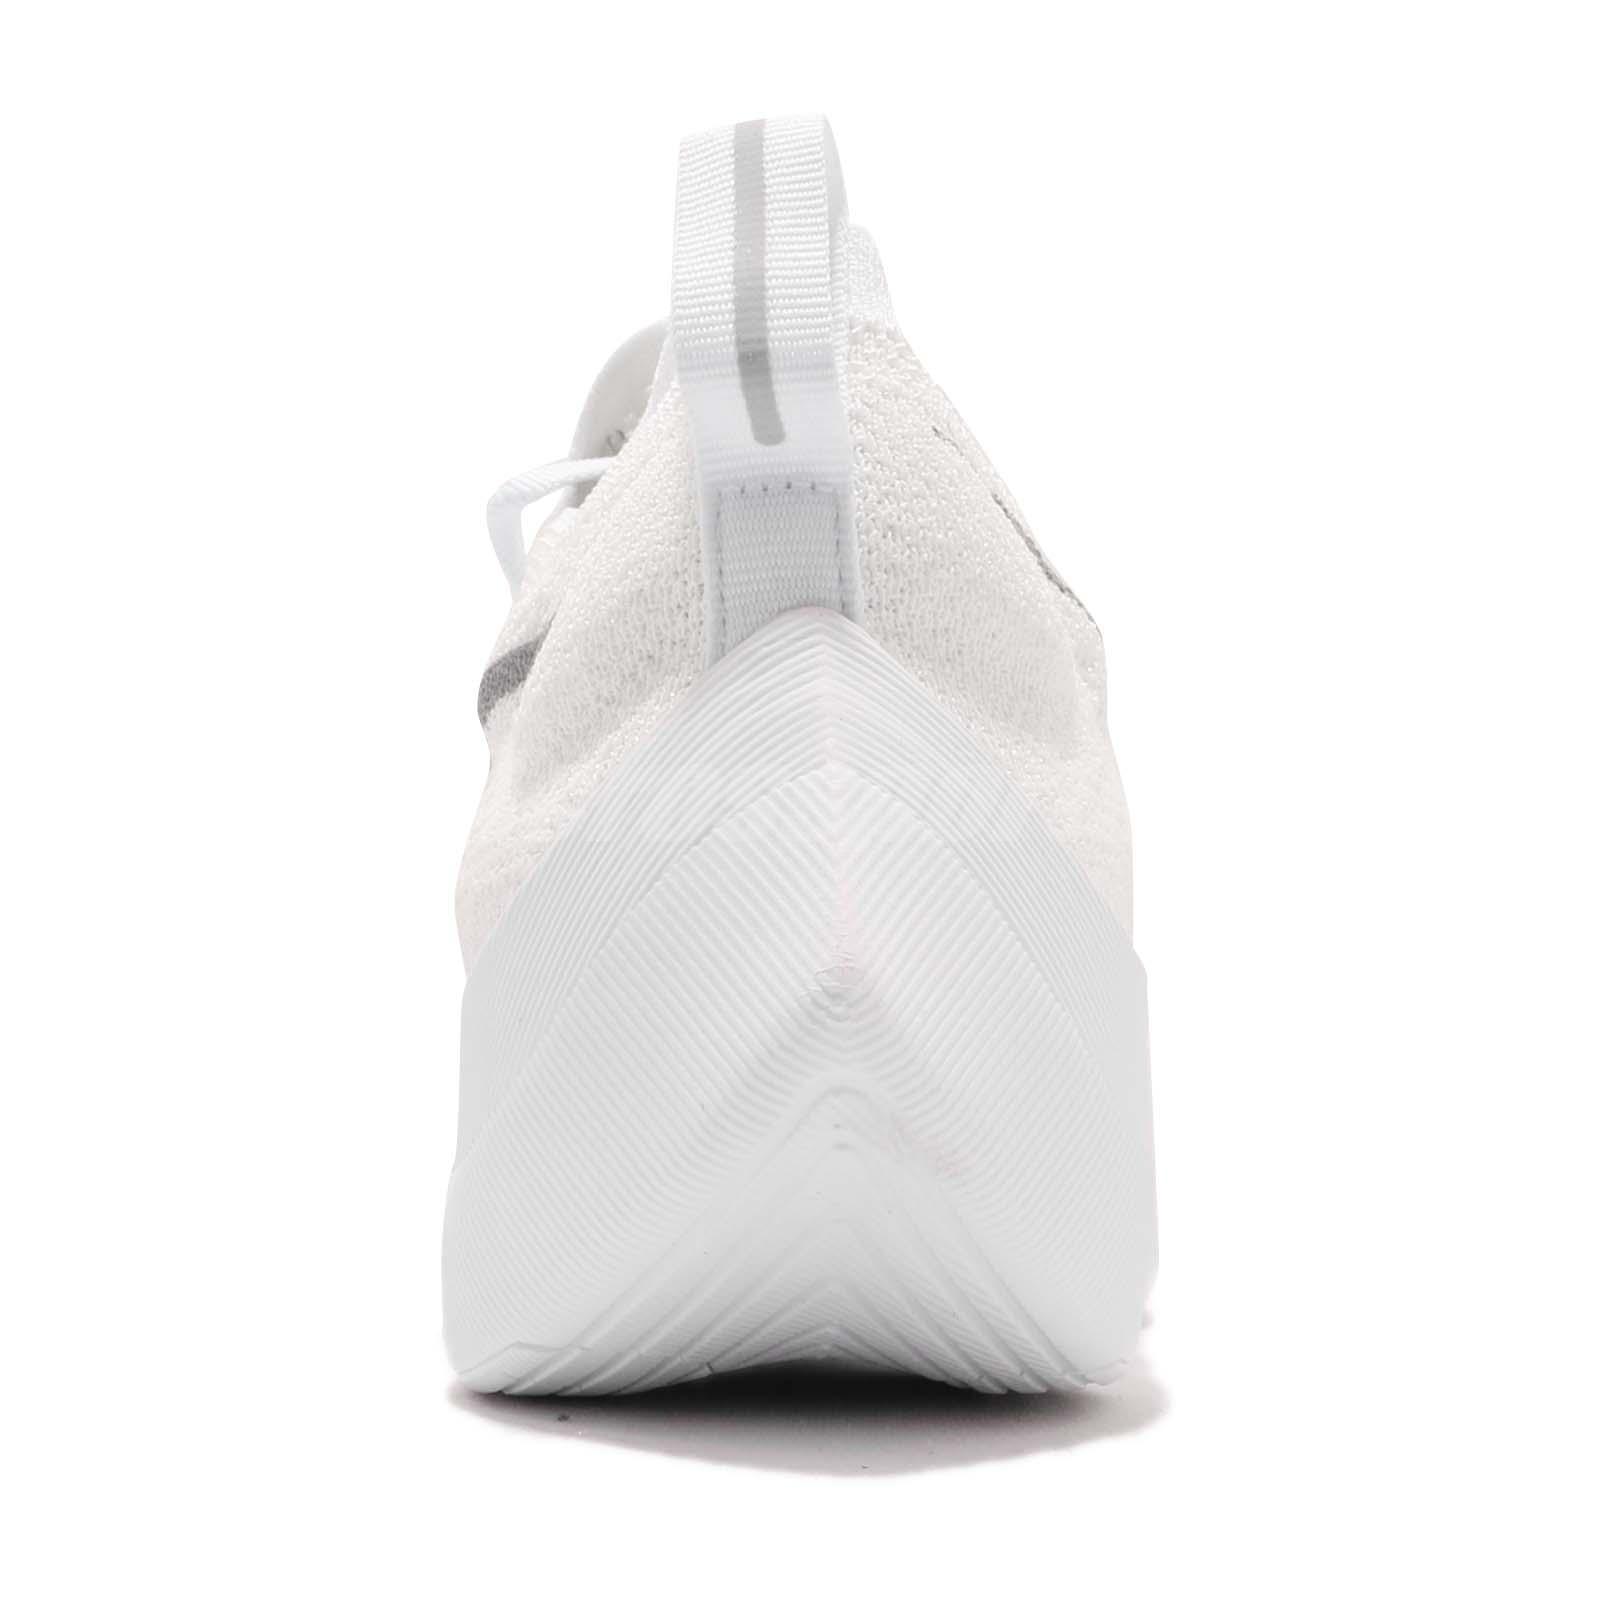 4b7865a346b Nike REACT Vapor Street Flyknit Big Swoosh White Grey Running Shoes ...